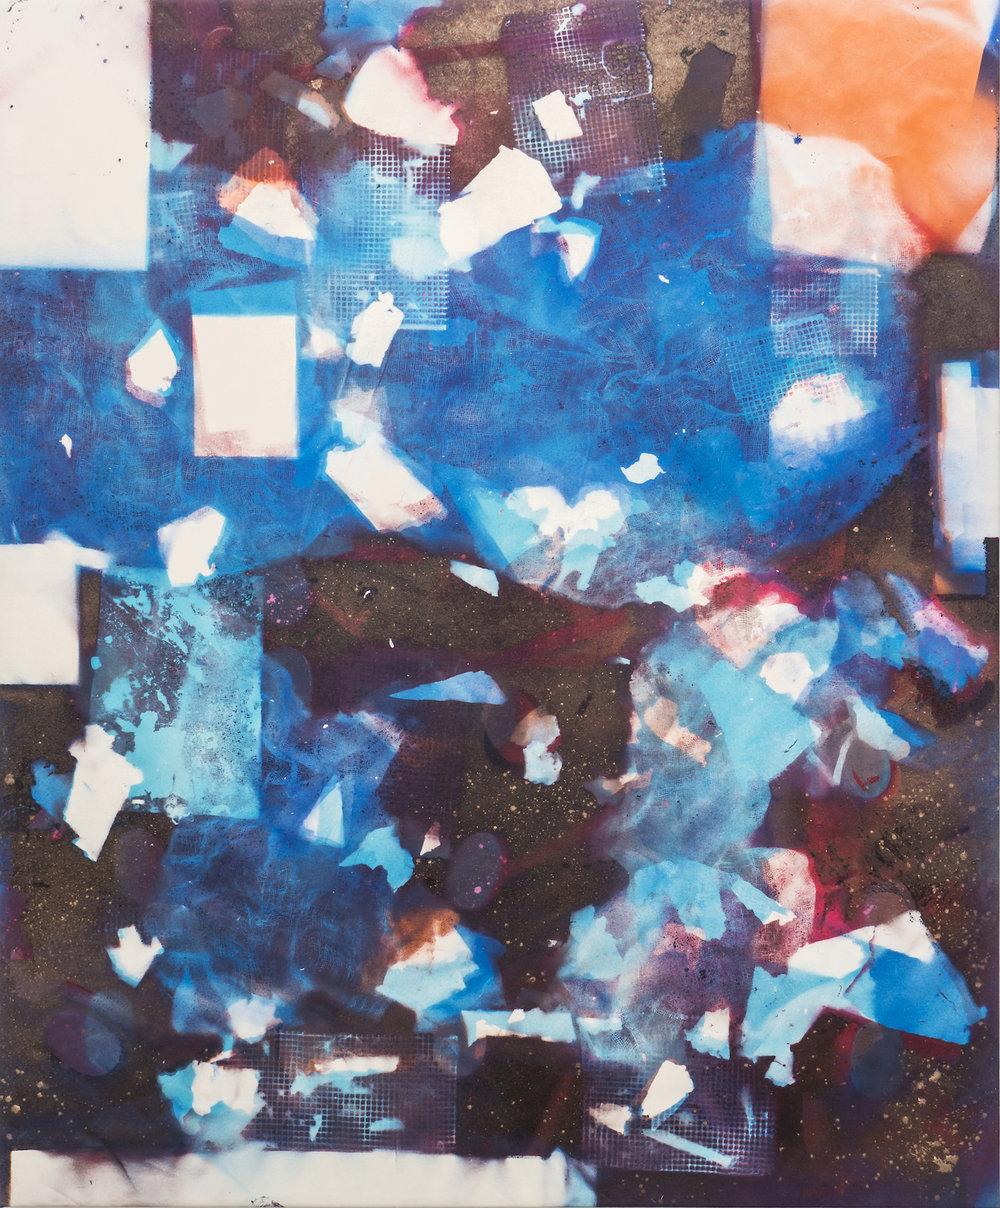 IAIN MUIRHEAD   1640  , 2016. Airborne pigment, acrylic binder, 10oz cotton duck canvas, white titanium gesso on verso,milled pine, 3mm staples, #8 screws. 95 x 77 inches.